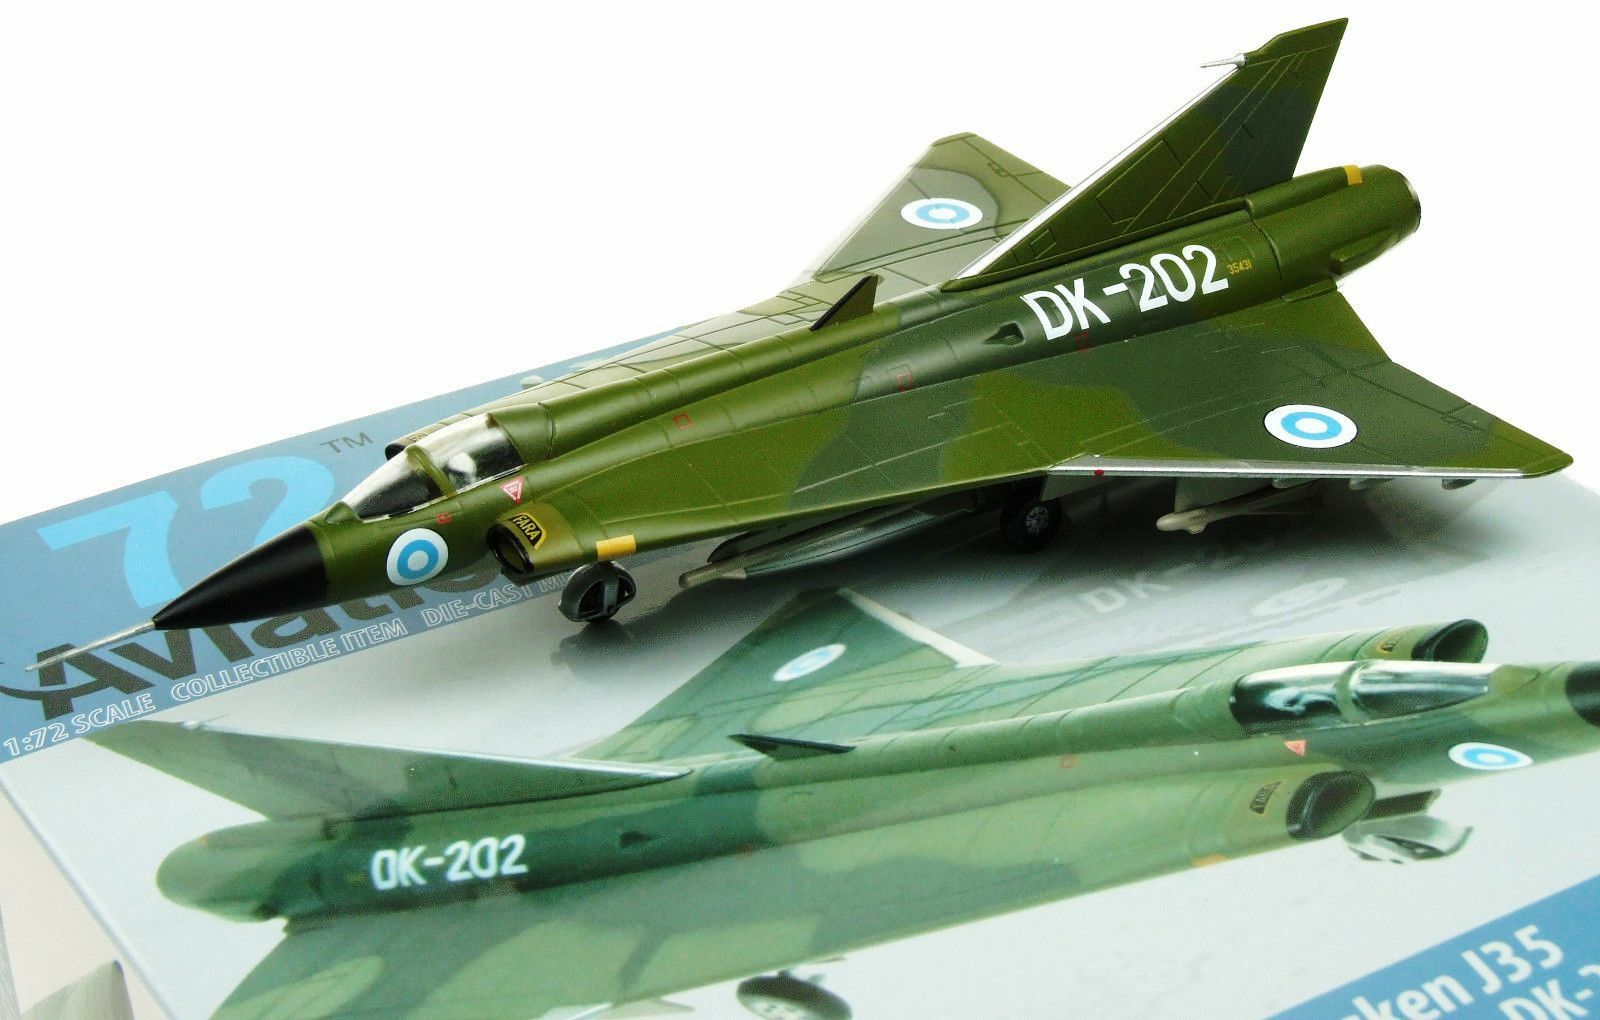 AVIATION72 AV7241005 1 72 SAAB DRAKEN J35 FINNISH AIR FORCE DK-202 W STAND - NEW